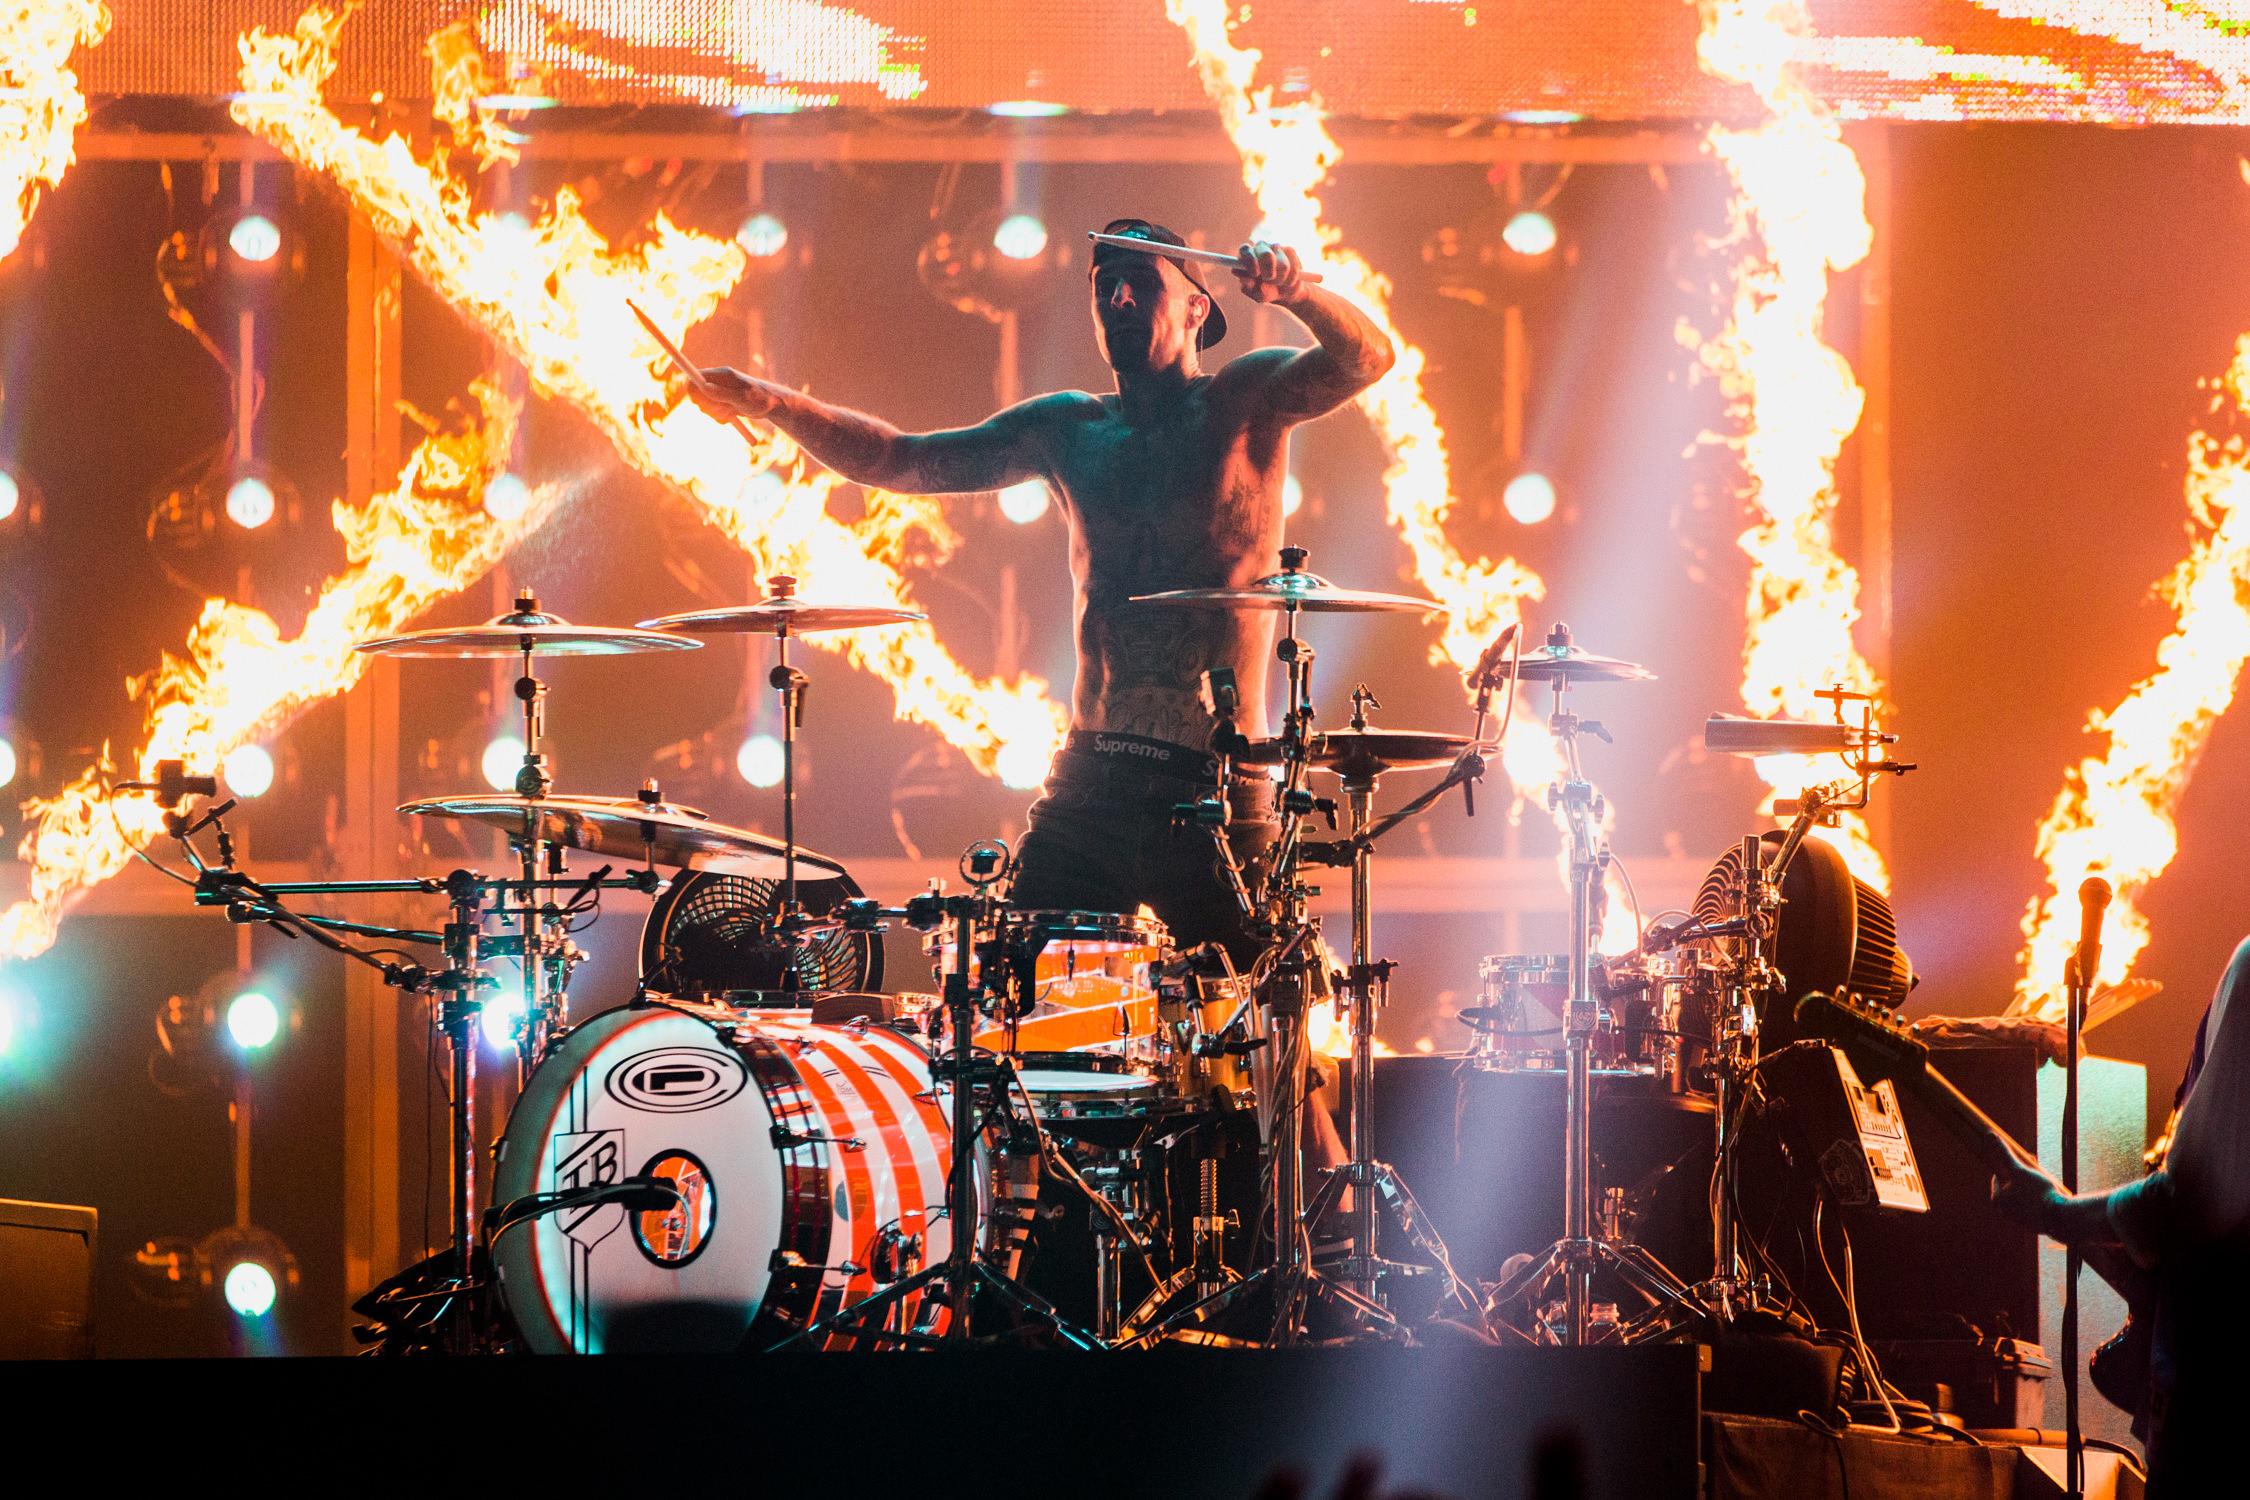 blink-182-travis-barker-pyro-live-show-AnnaLeeMedia